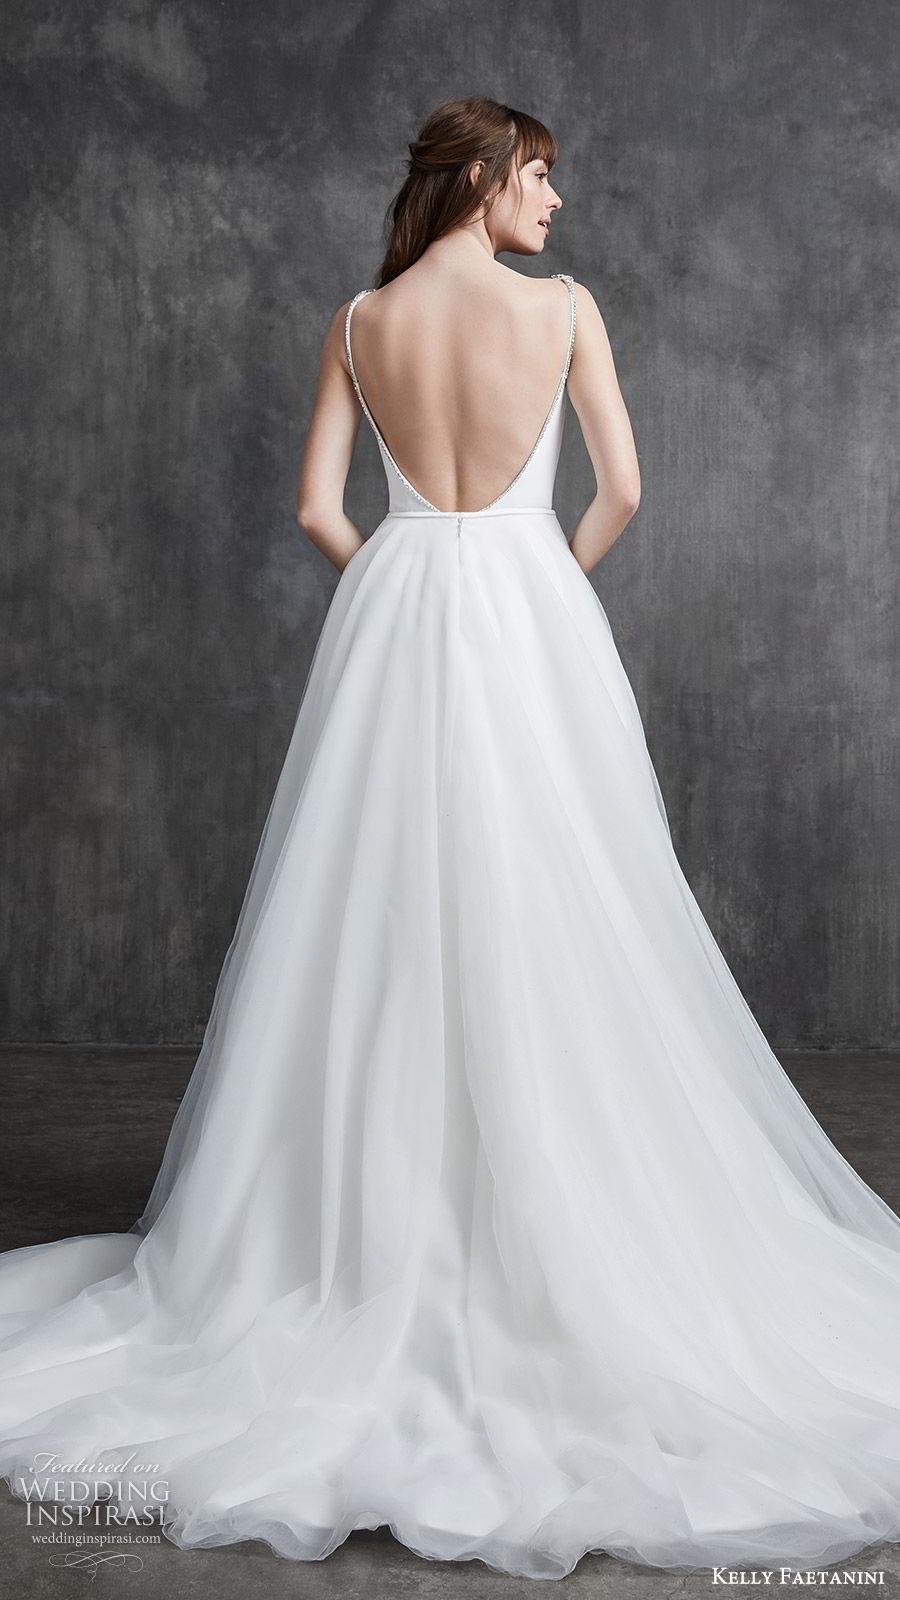 kelly faetanini spring 2020 bridal sleeveless beaded straps bateau neckline sheath wedding dress (10) ball gown overskirt low open back chapel train clean minimalist bv